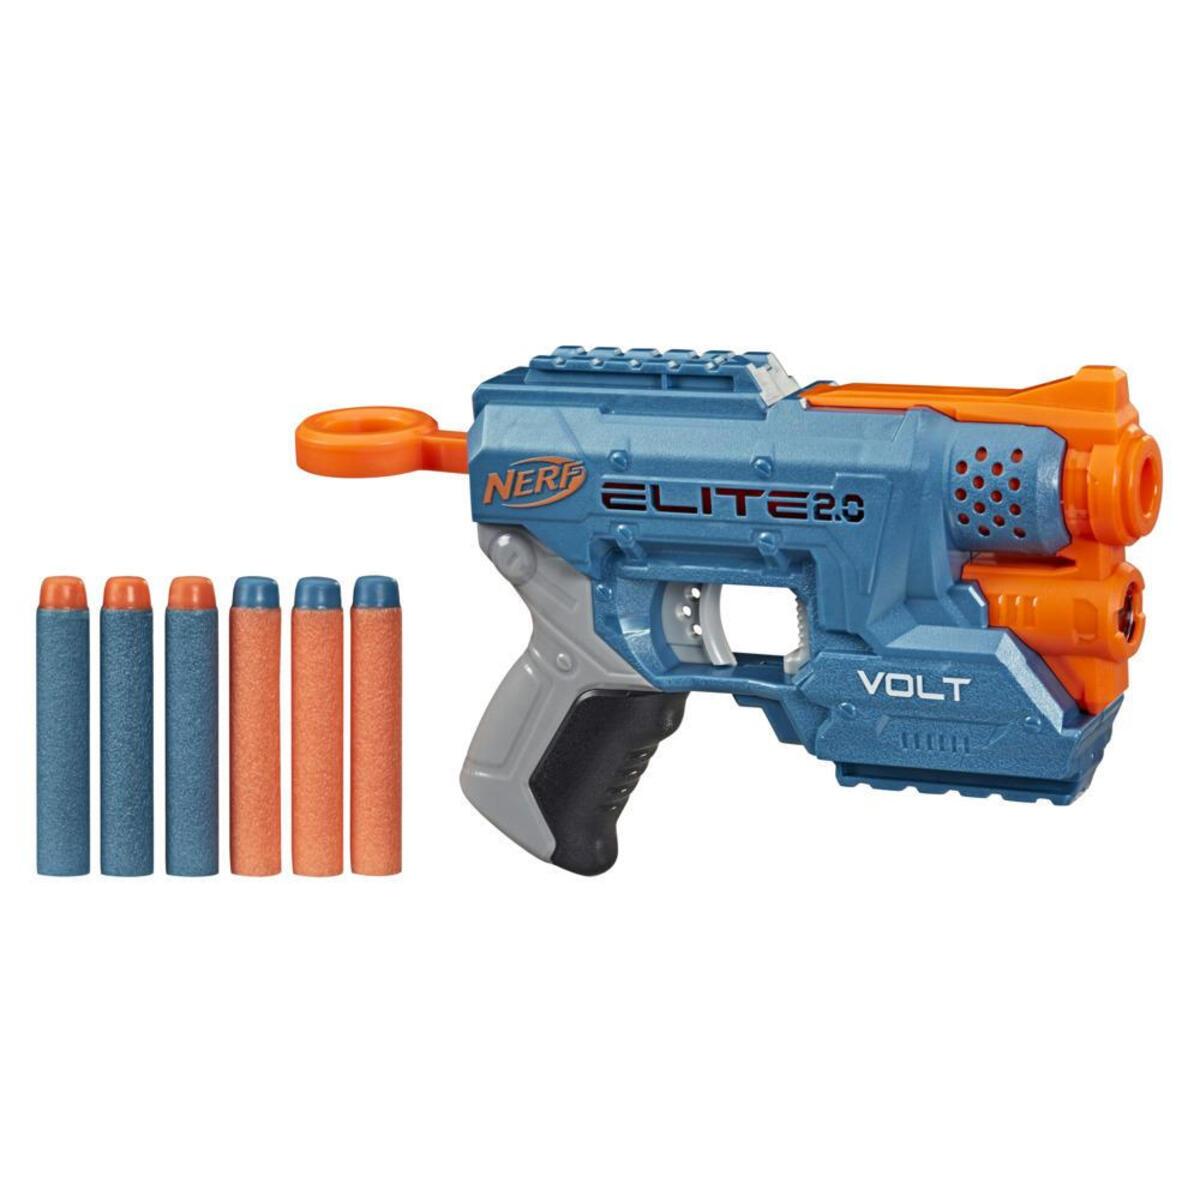 Arma De Brinquedo Nerf Elite 2.0 VOLT SD-1 hasbro